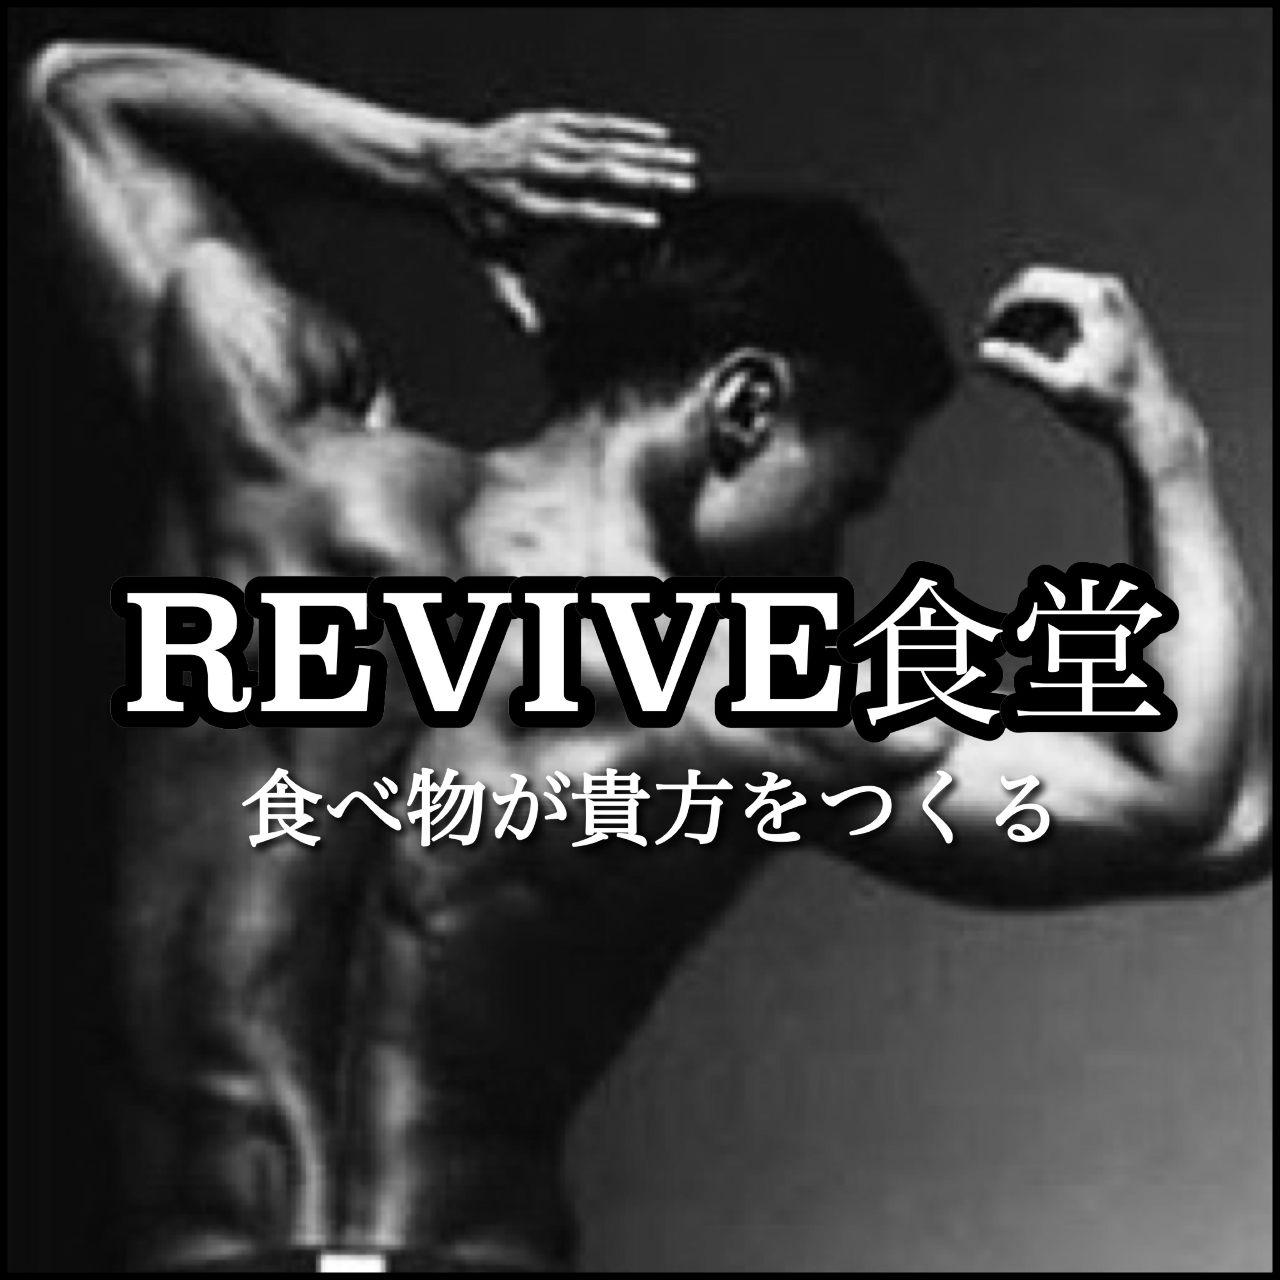 REVIVE食堂のイメージ写真